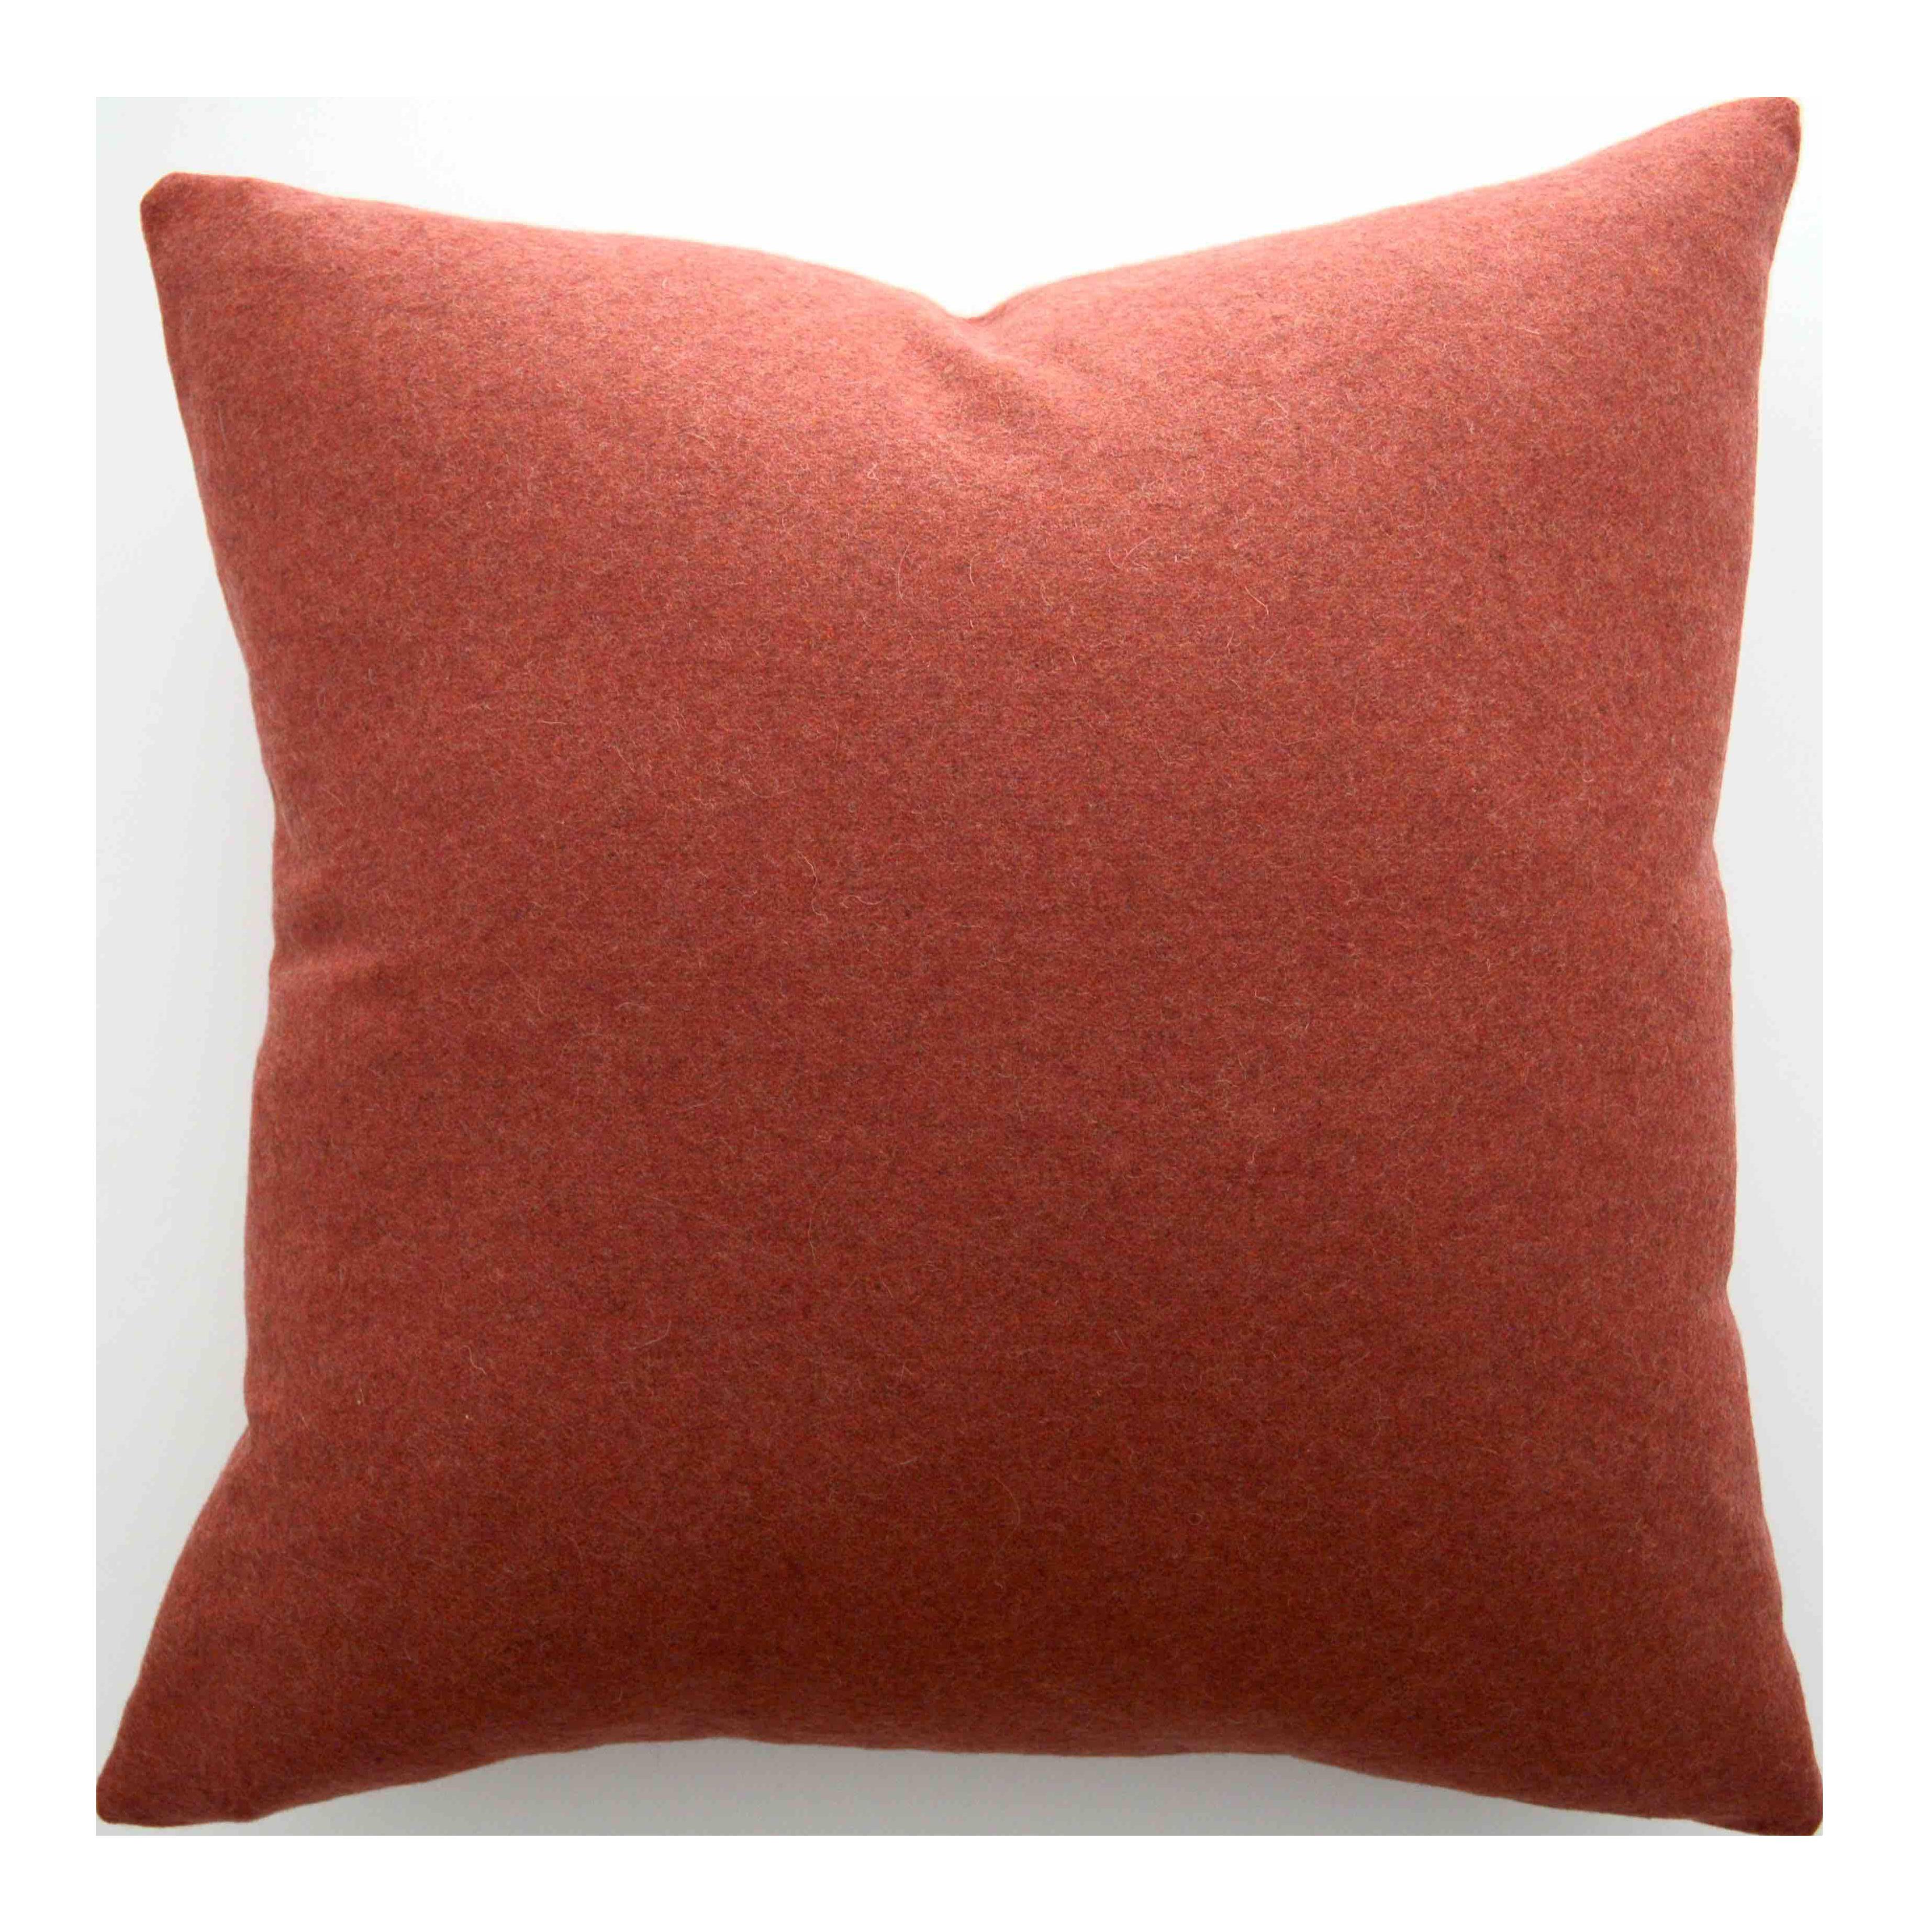 decor hargreaves pdx pillow orange pillows corded reviews wayfair three lumbar throw posts